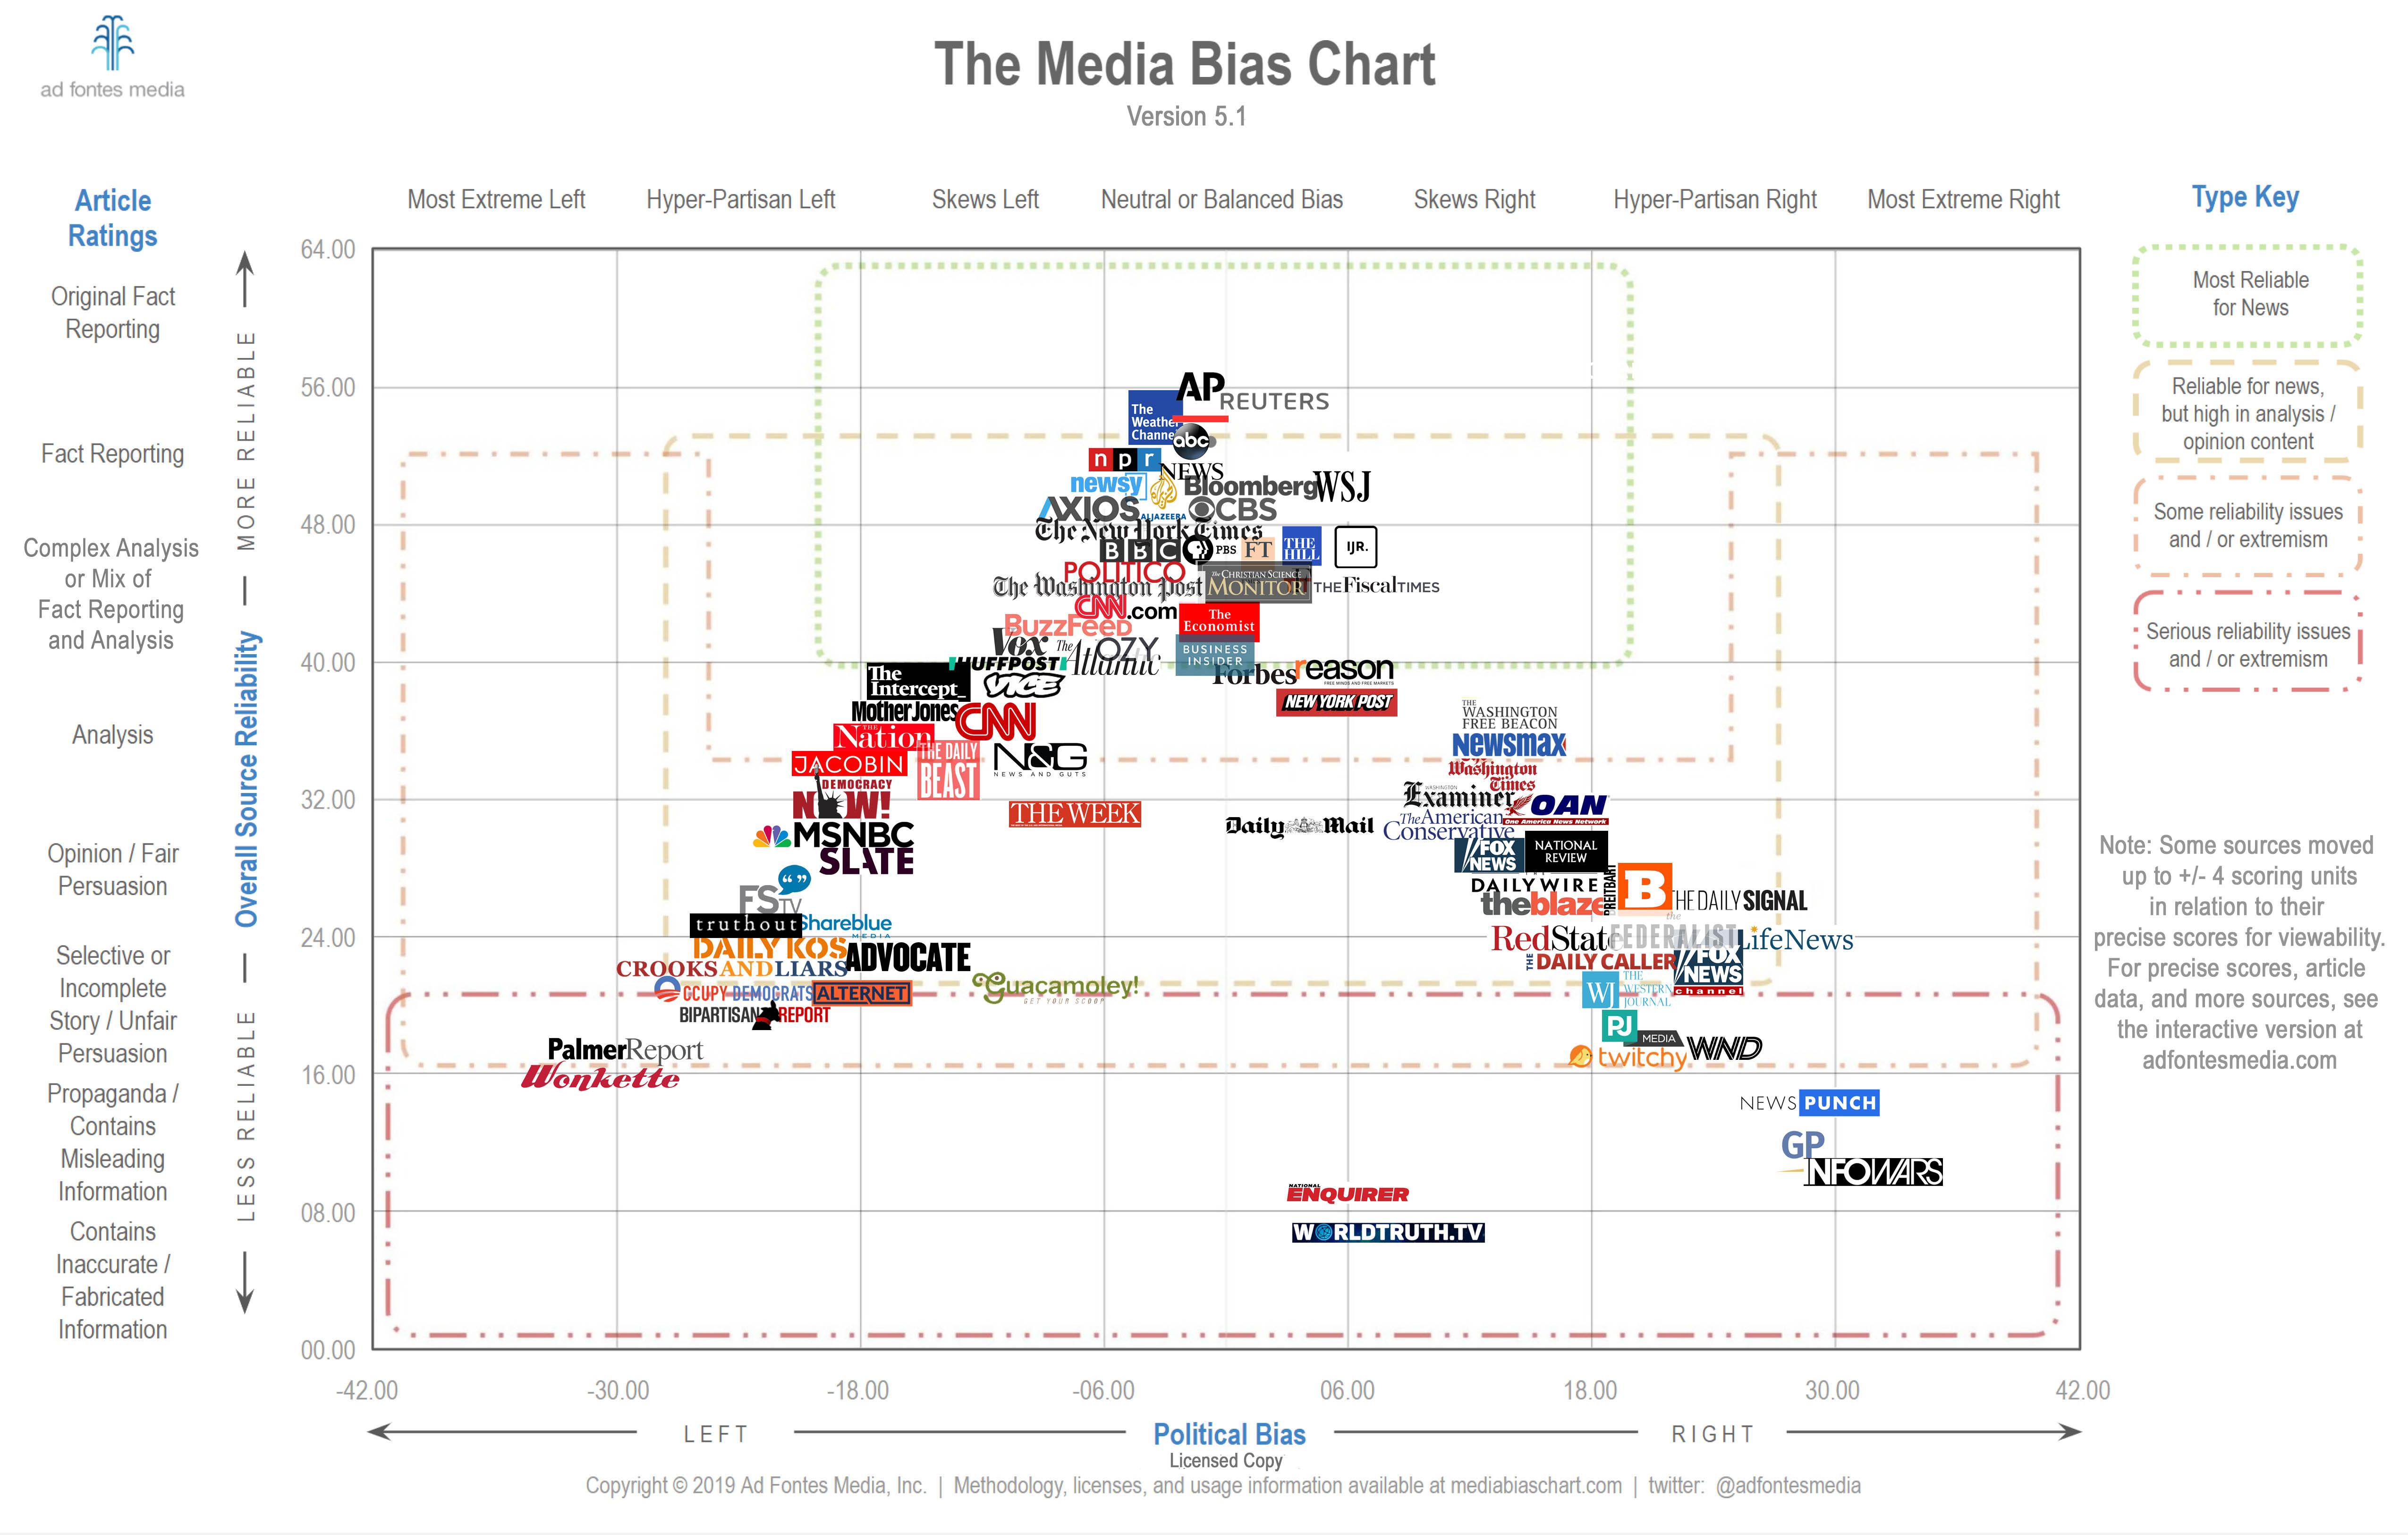 Media-Bias-Chart-5.1-Licensed.jpg